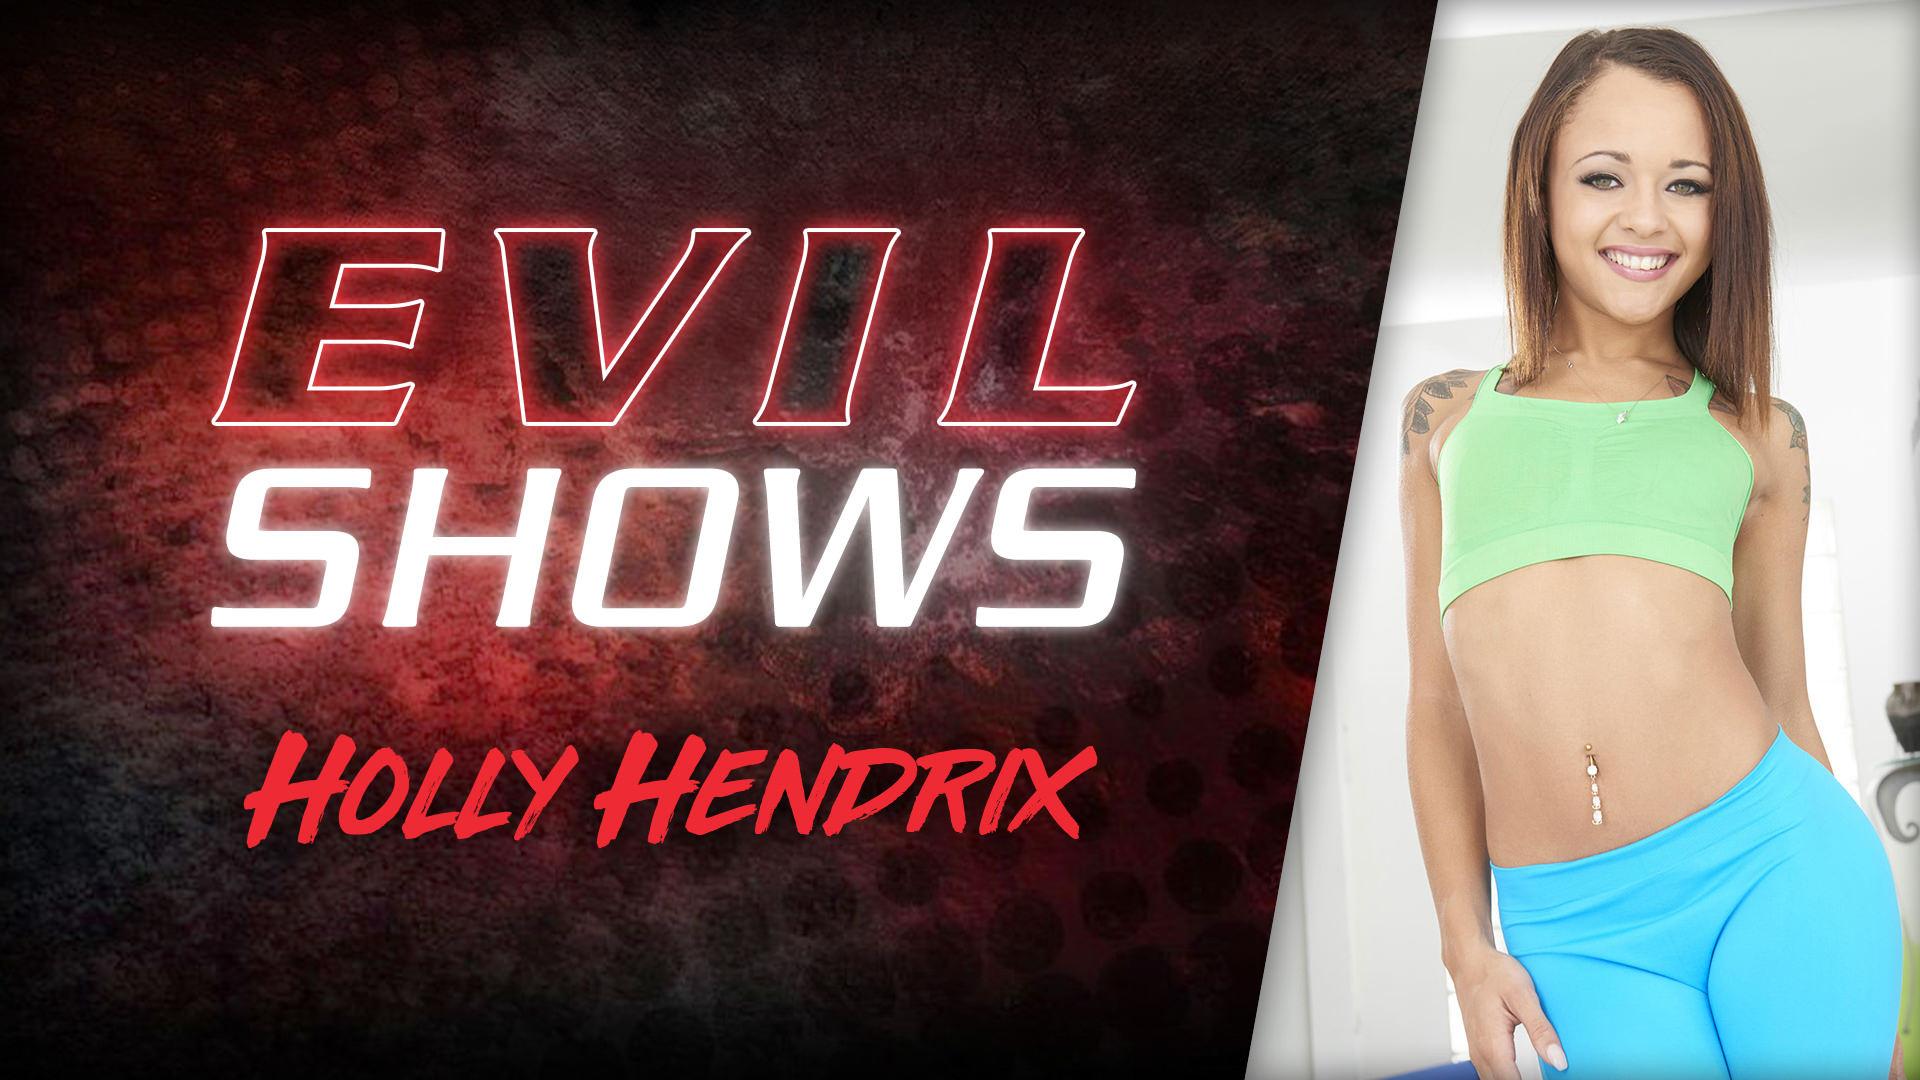 Evil Shows - Holly Hendrix